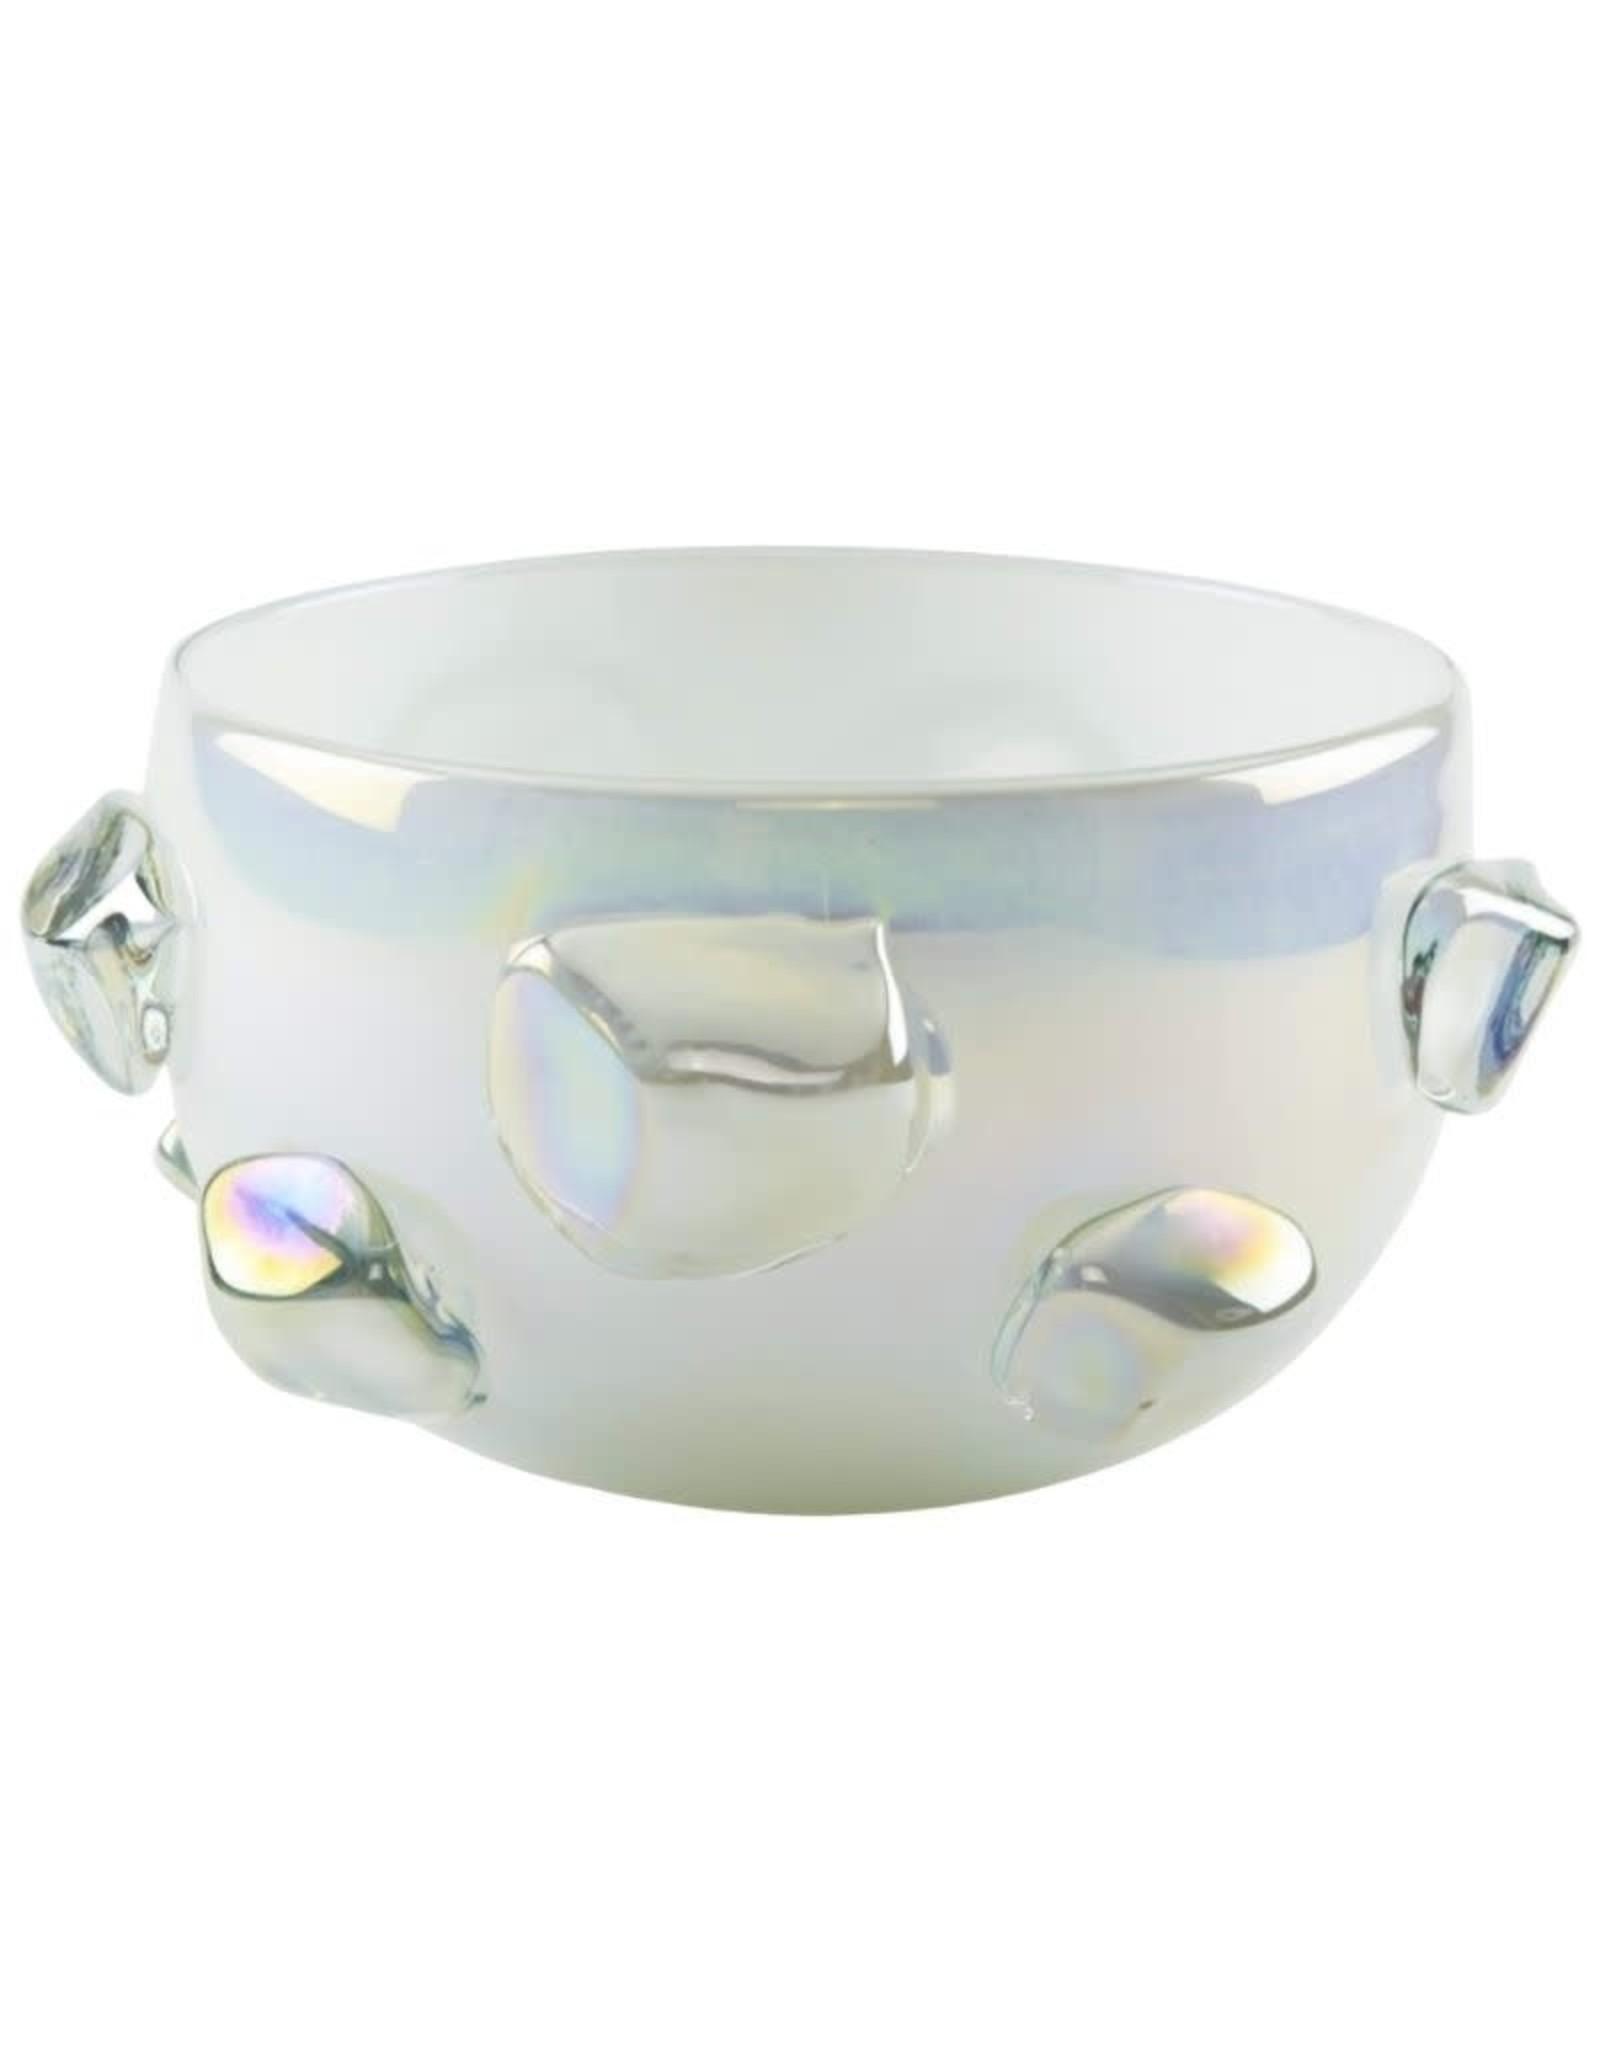 Ice Design Bowl - White